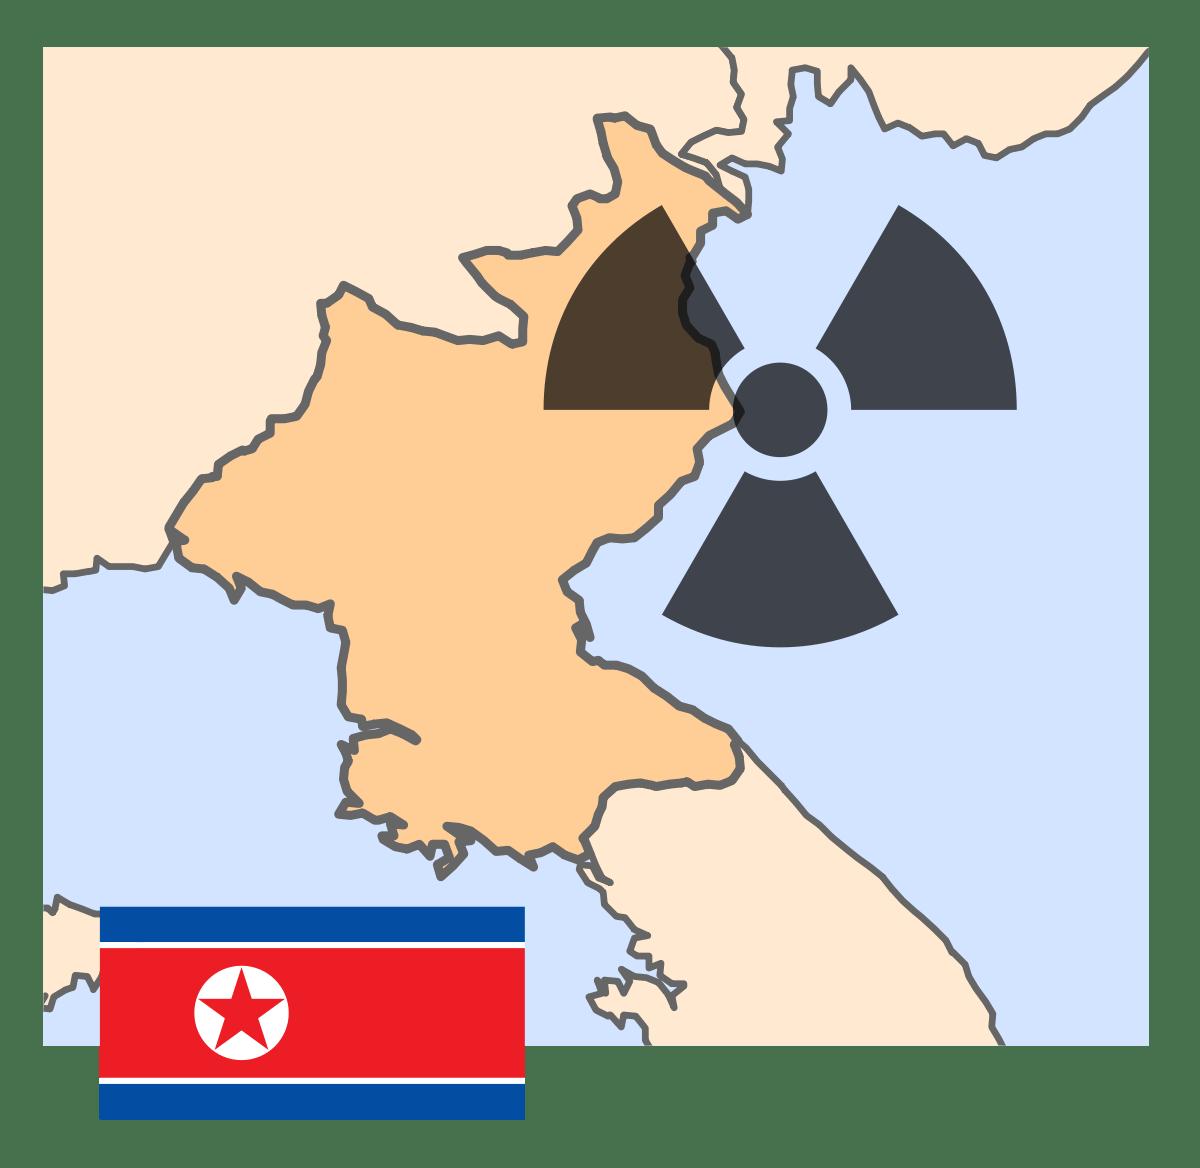 Nuke nuclear accident